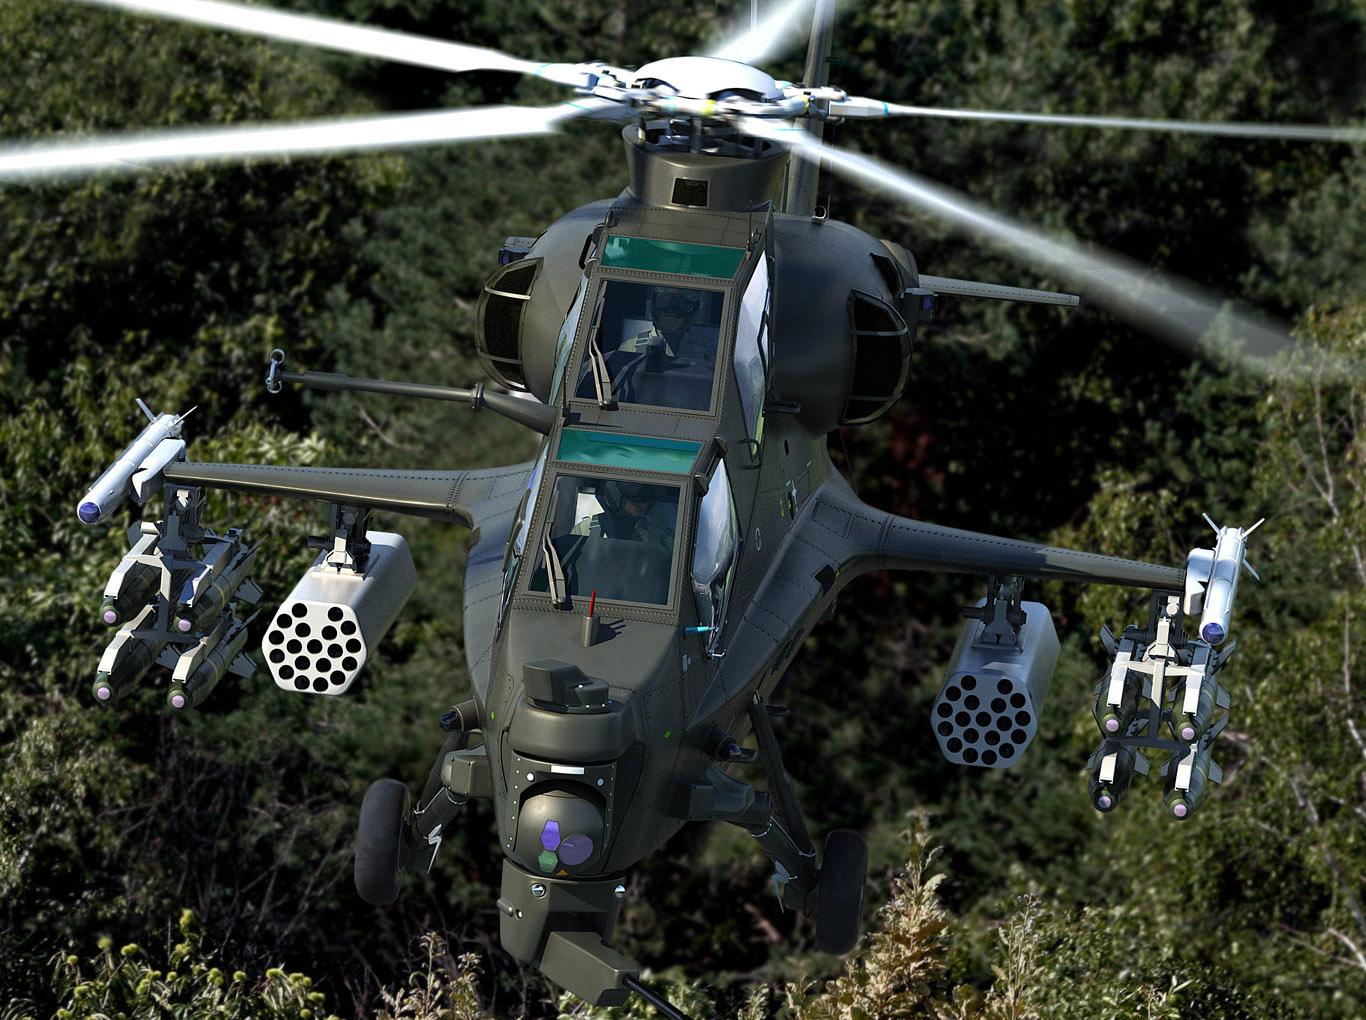 El helicóptero chino de combate más moderno fue diseñado por ingenieros rusos Cgi+kit+tool+armed+Chinese+Z-10+Attack+Helicopter+gunship+PLA+Peoples+Liberation+Army+Air+Force+export+pakitan+missile+hj10+atgm+rocket+(1)